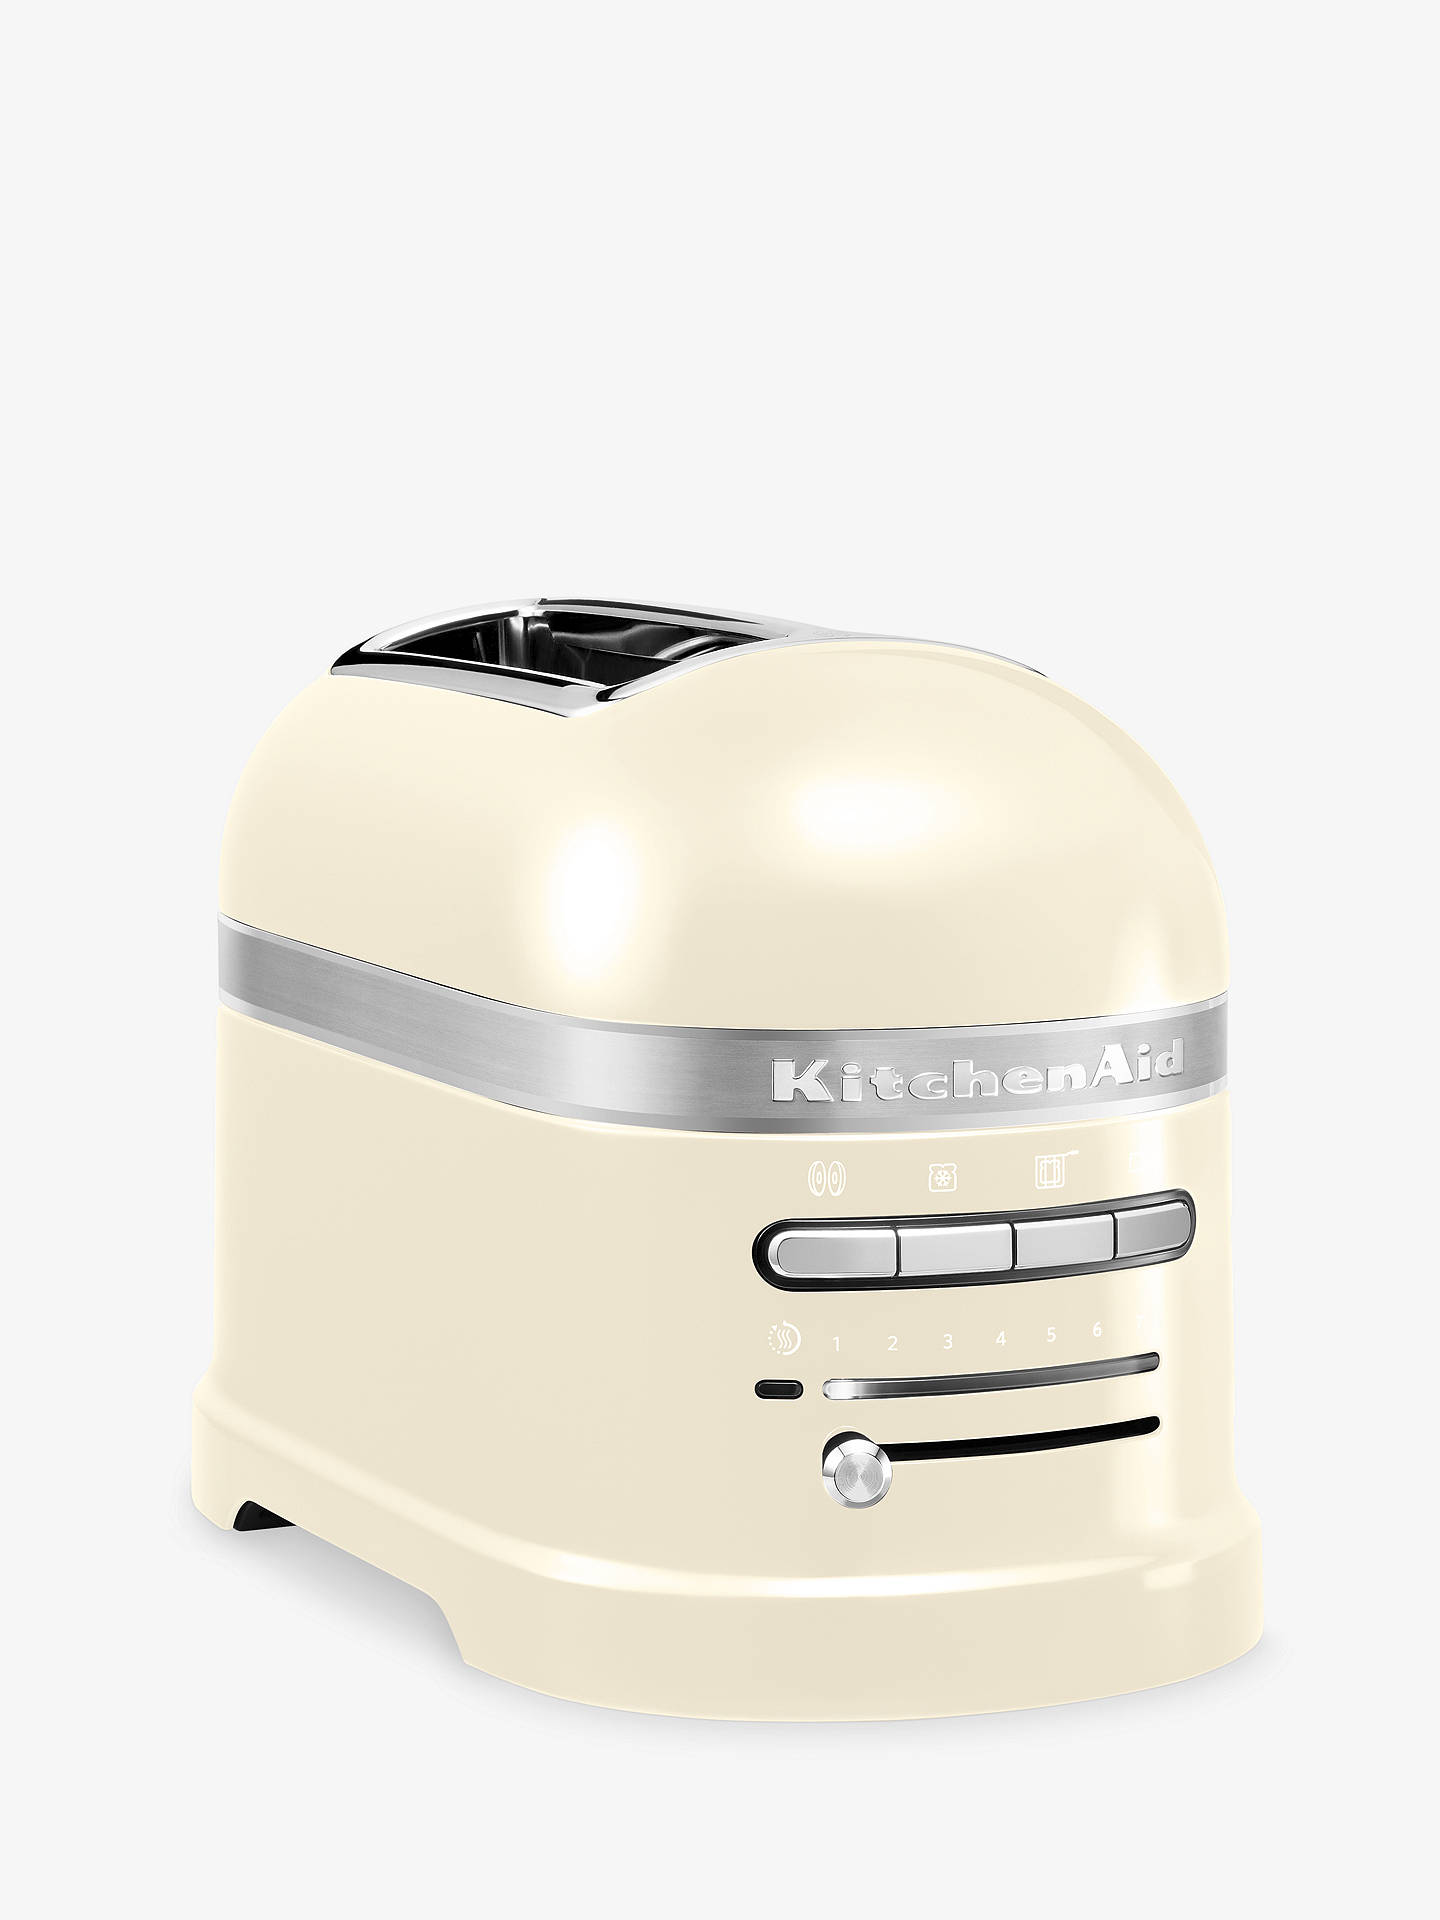 KitchenAid Artisan 2-Slice Toaster at John Lewis & Partners on dualit toaster, a toaster, best toaster, 4 slice toaster, viking toaster, commercial toasters, delonghi toasters, sunbeam toaster, cuisinart toaster, toaster oven, 4-slice toaster, green toaster, oster toaster, cuisinart toaster oven, bella toaster, red toaster, electric toaster, bread toasters, hamilton beach toaster, tangerine toaster, stainless steel toaster, almond colored toaster, retro toaster, conveyor toaster, commercial toaster, bagel toaster, delonghi toaster, bread toaster,